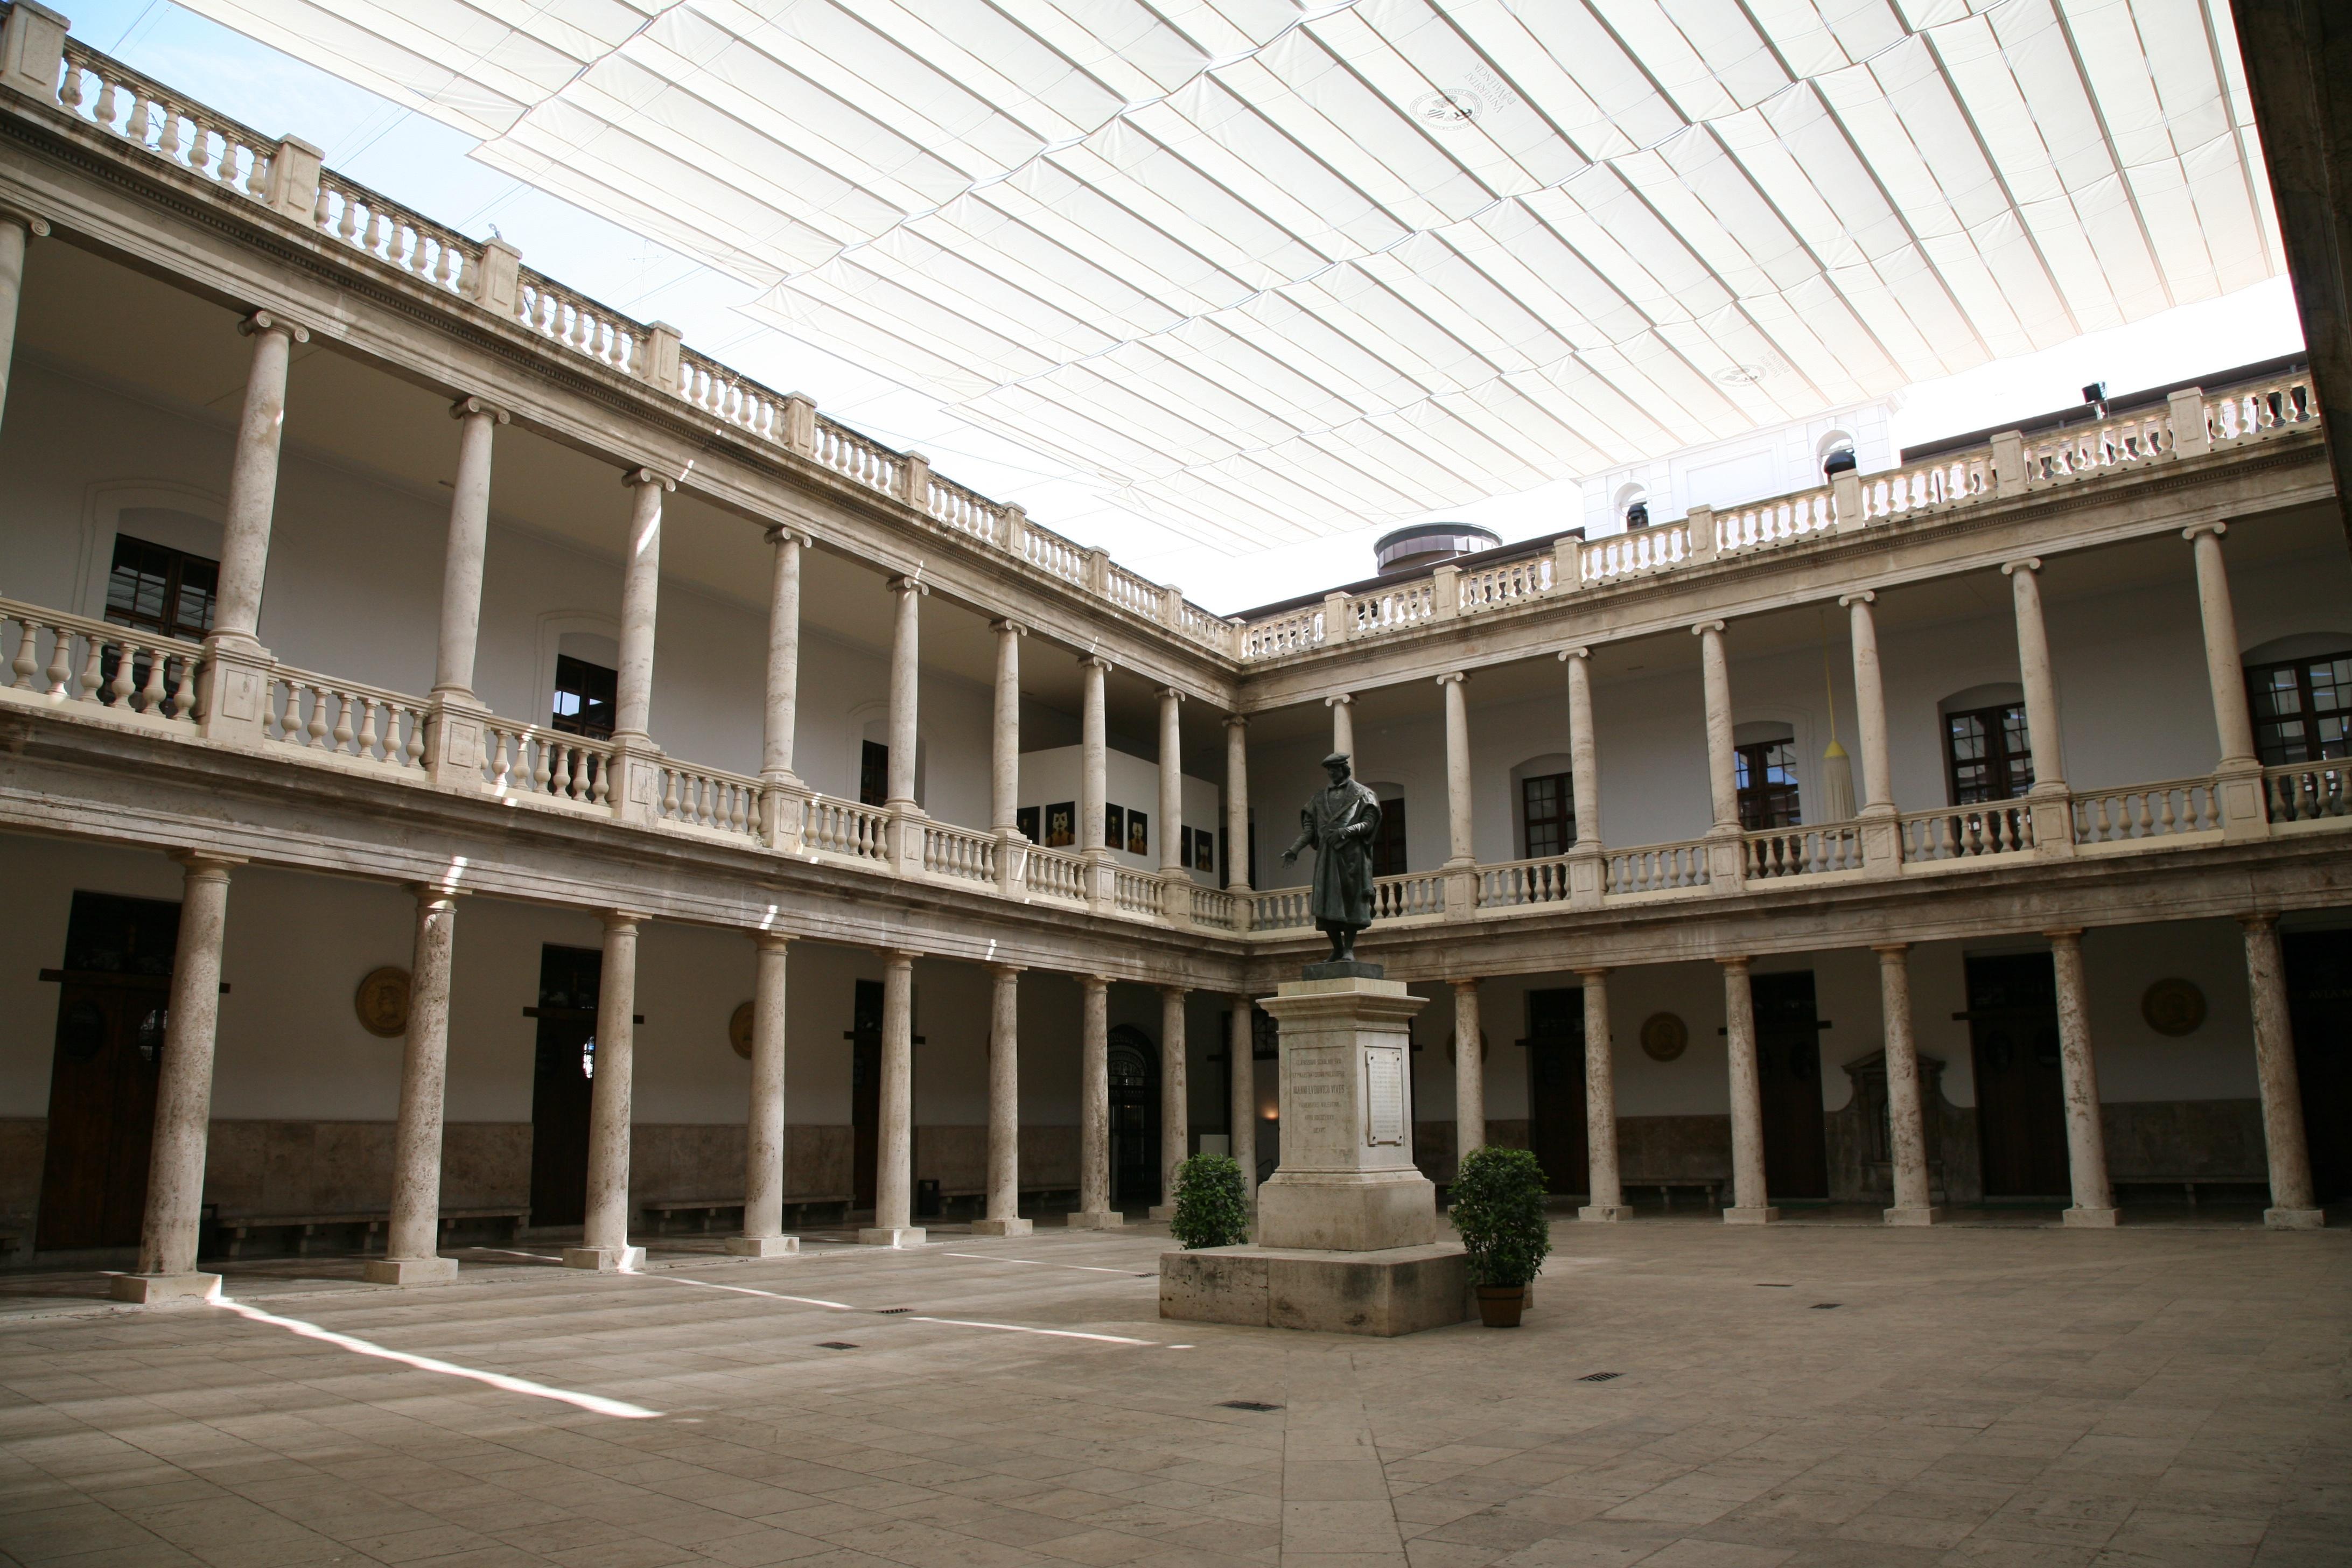 Fotos gratis arquitectura estructura edificio palacio for Universidades de arquitectura en espana